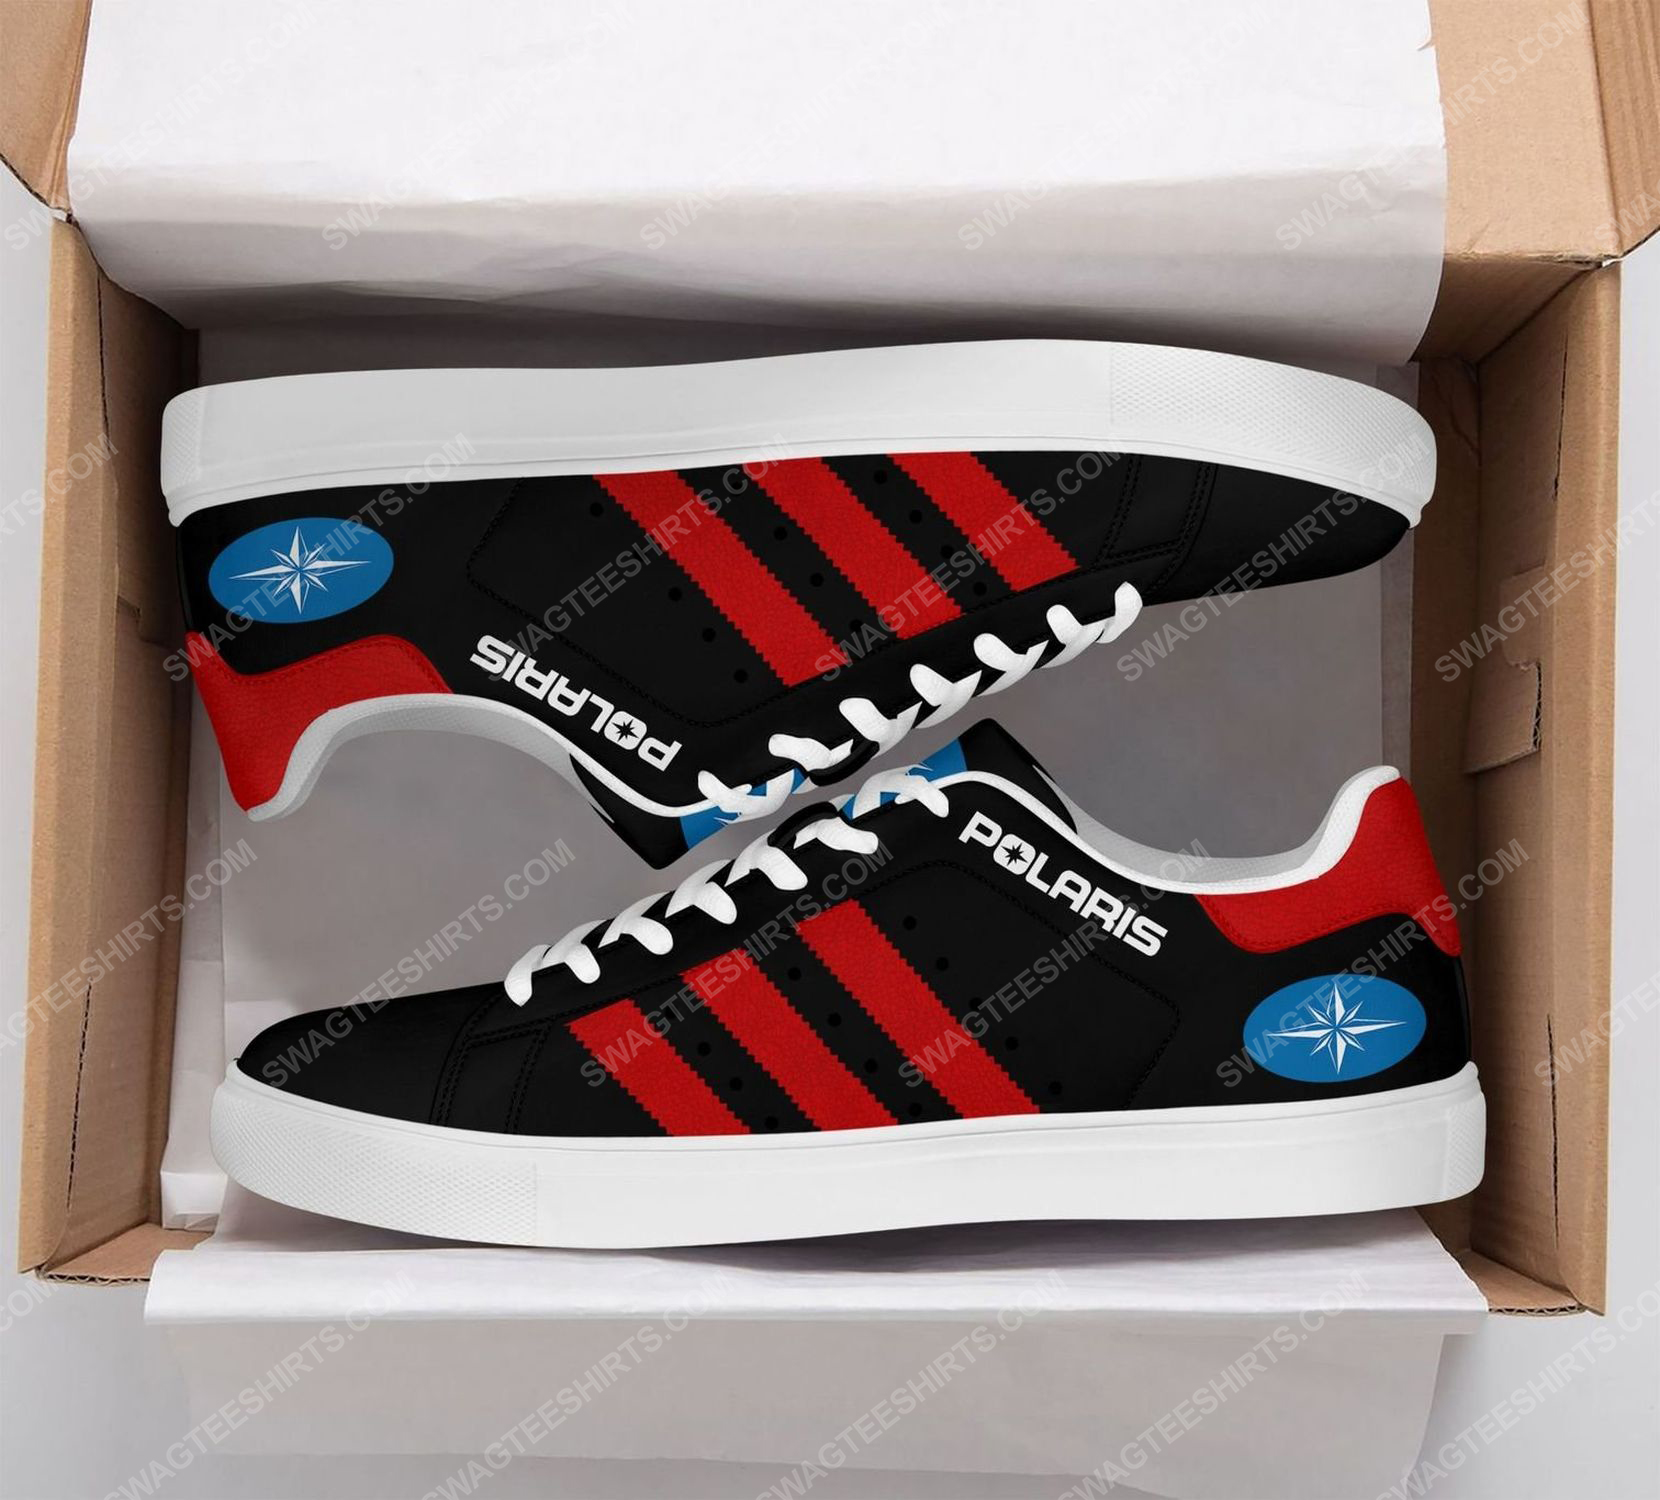 Polaris racing version black stan smith shoes 2